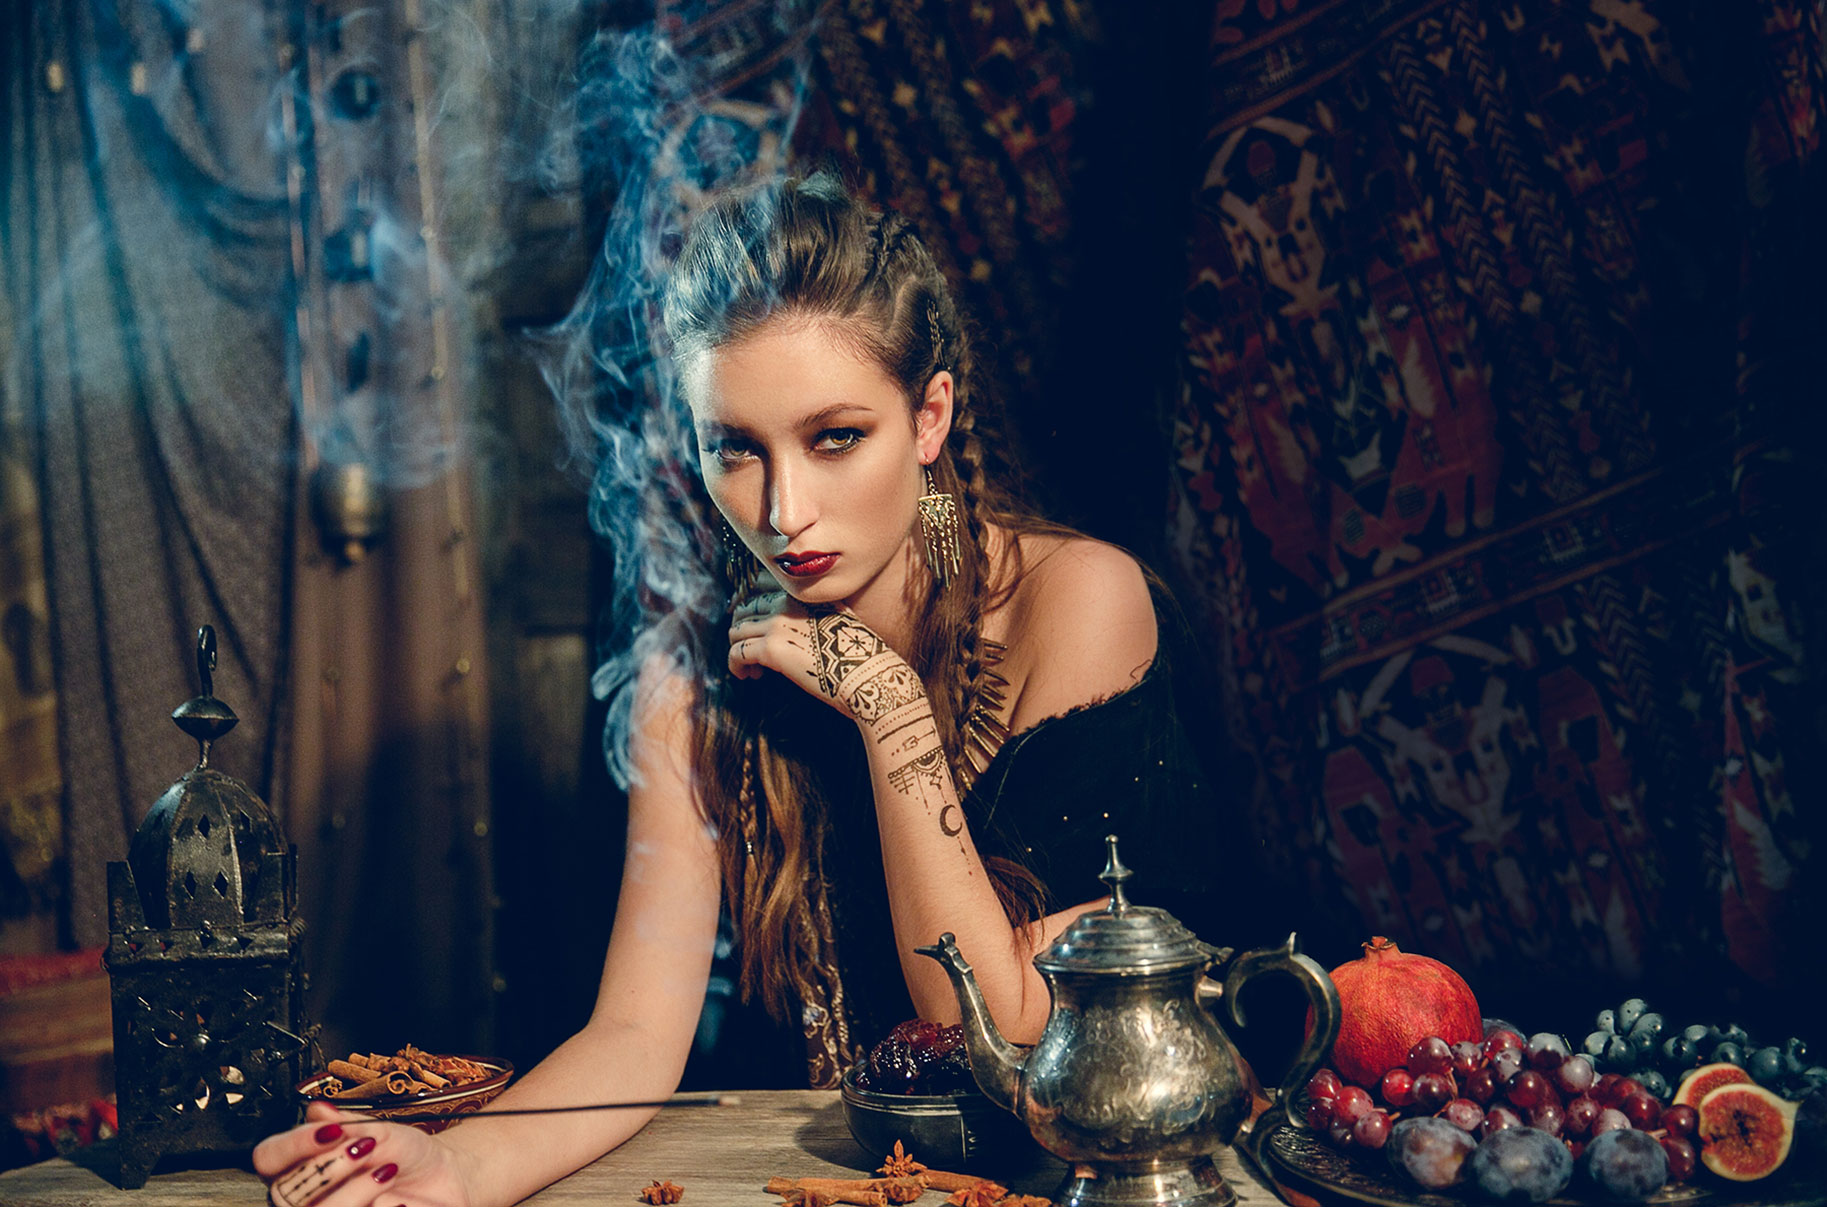 Принцесса специй Валерия Панкратова / Valeriya Pankratova by Kseniya Chebiryak